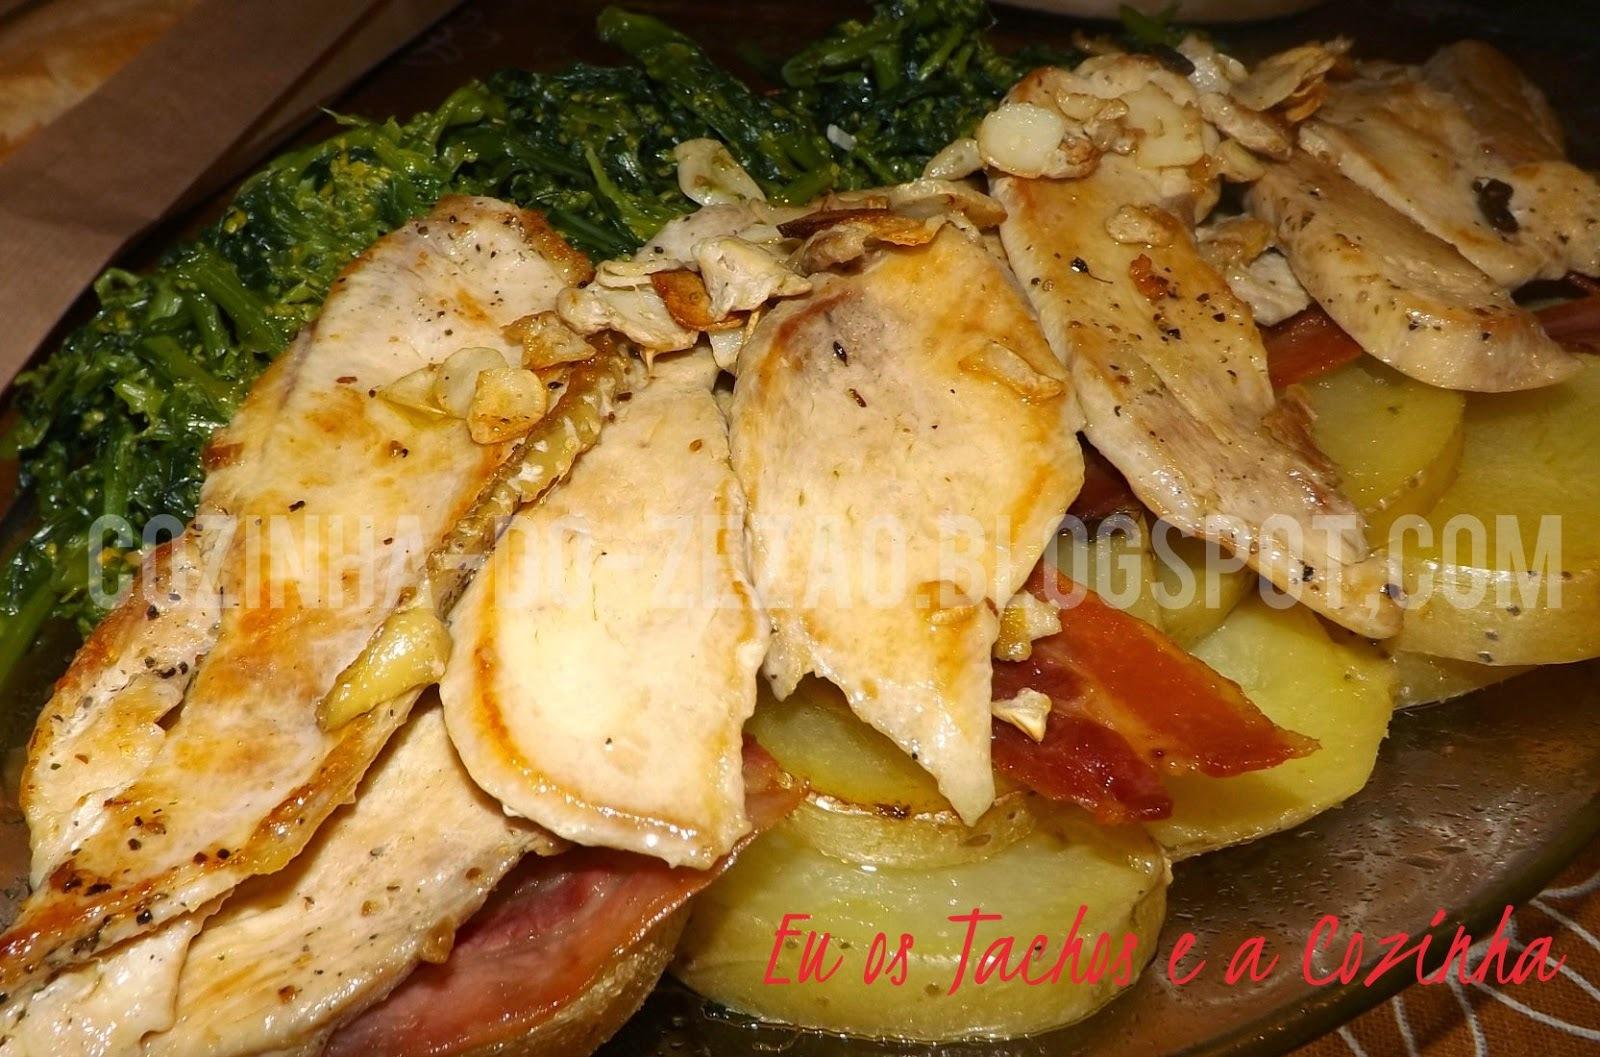 Peito de frango com bacon crocante